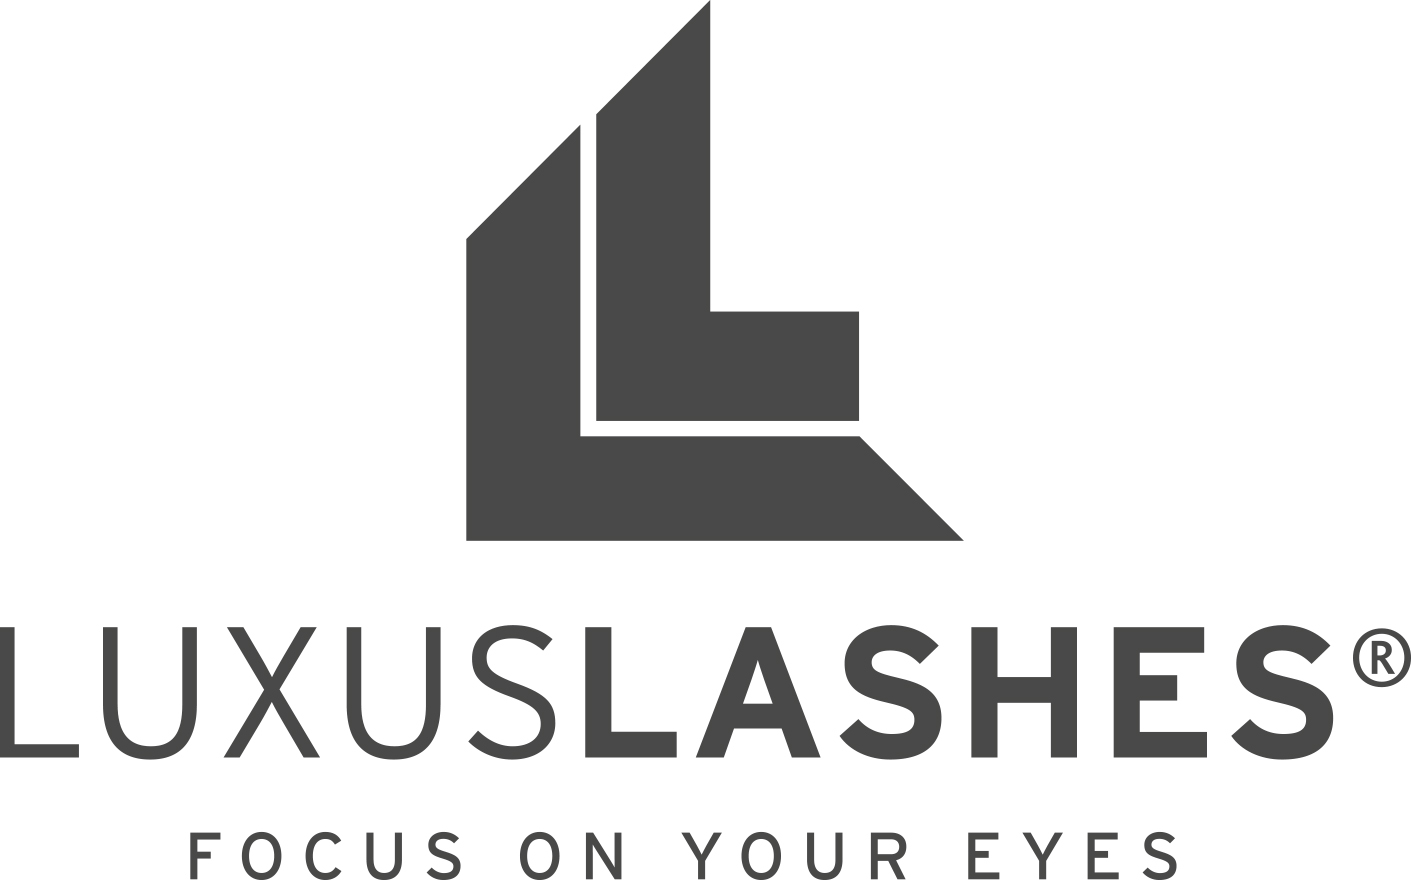 logo_luxuslashes_dunkelgrau_ohne_subline.jpg